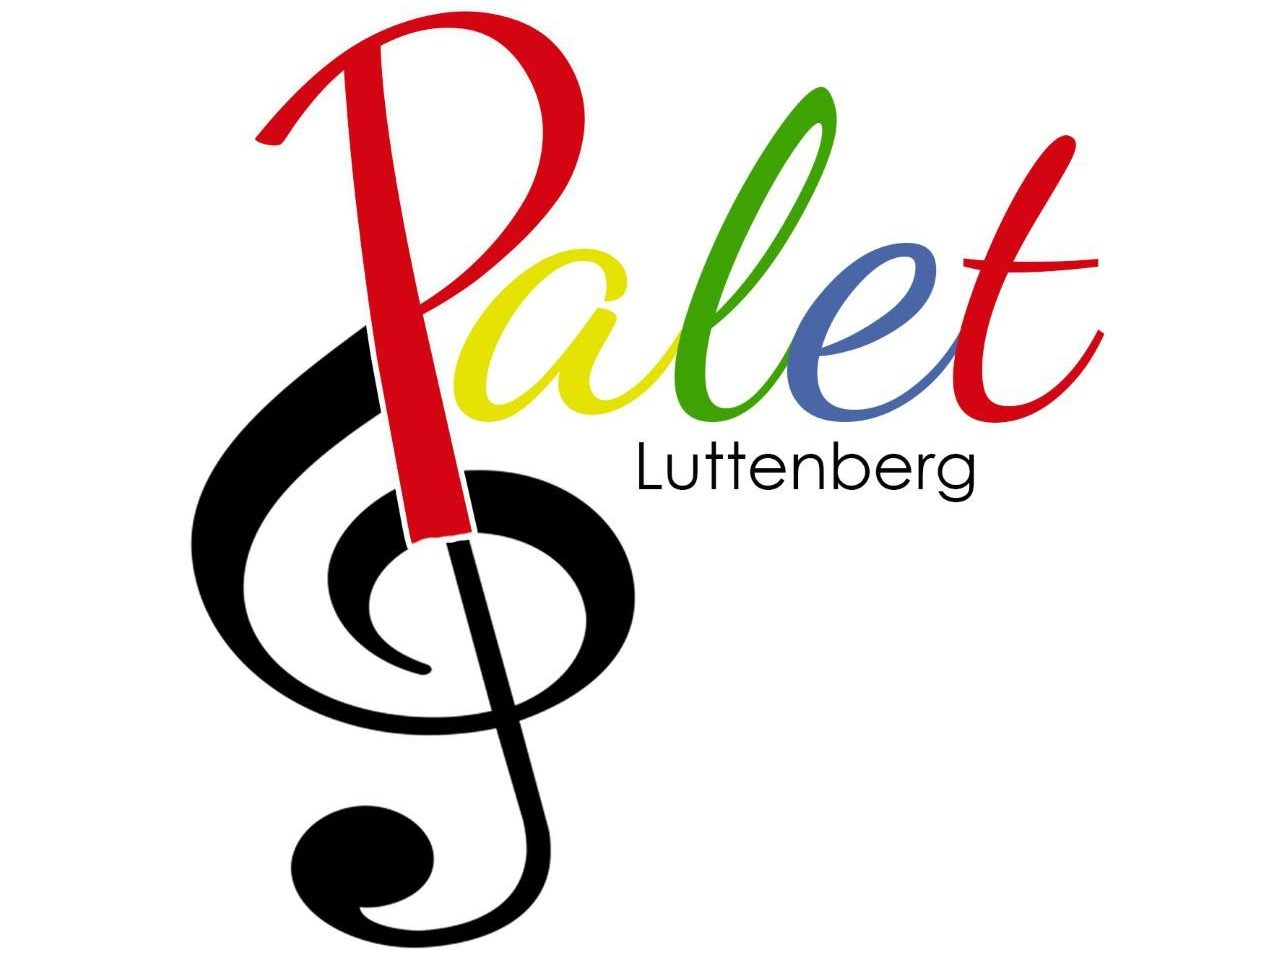 Palet Luttenberg